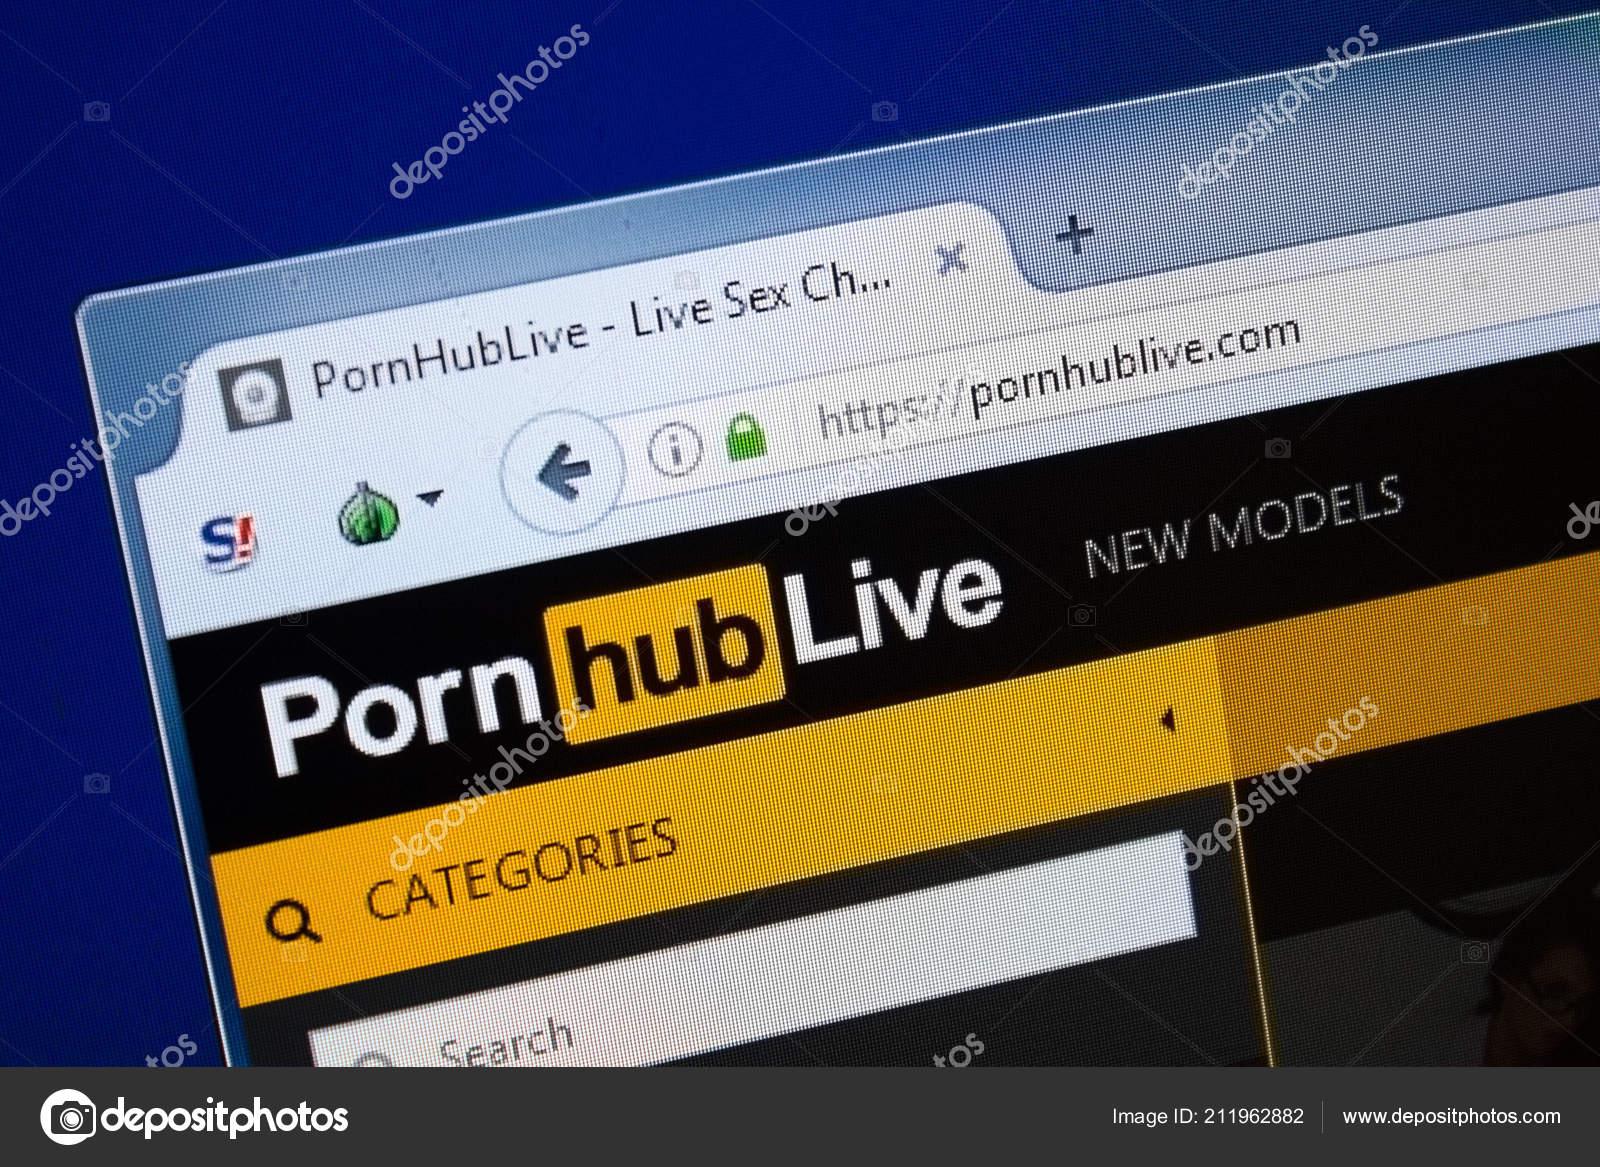 Congratulate, porn hub live free apologise